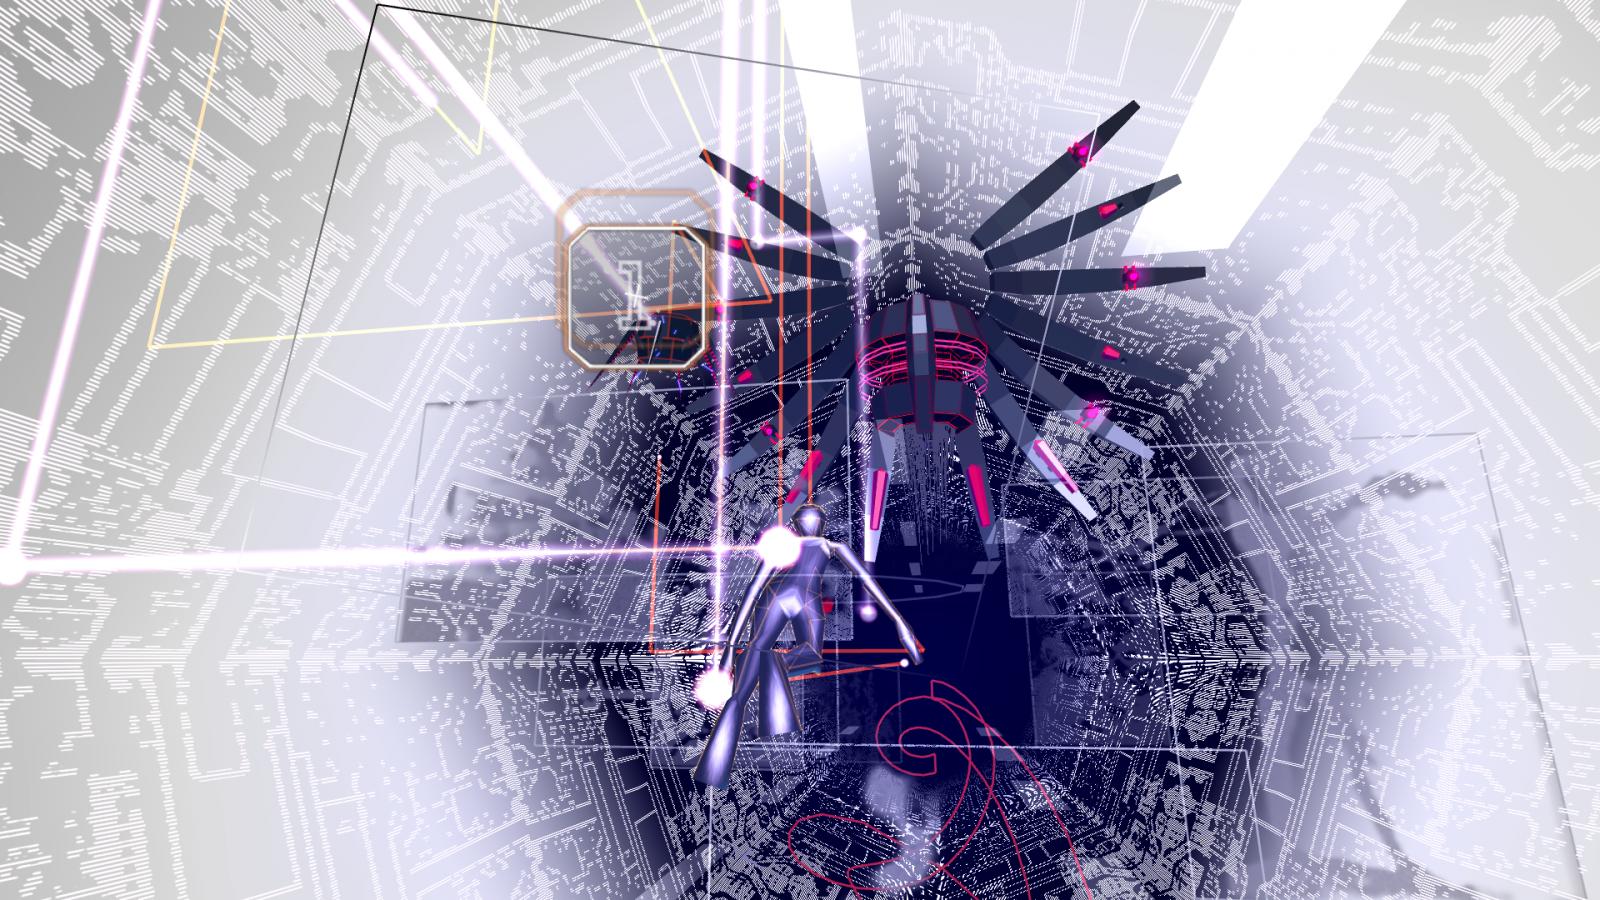 Rez Infinite Zone 5